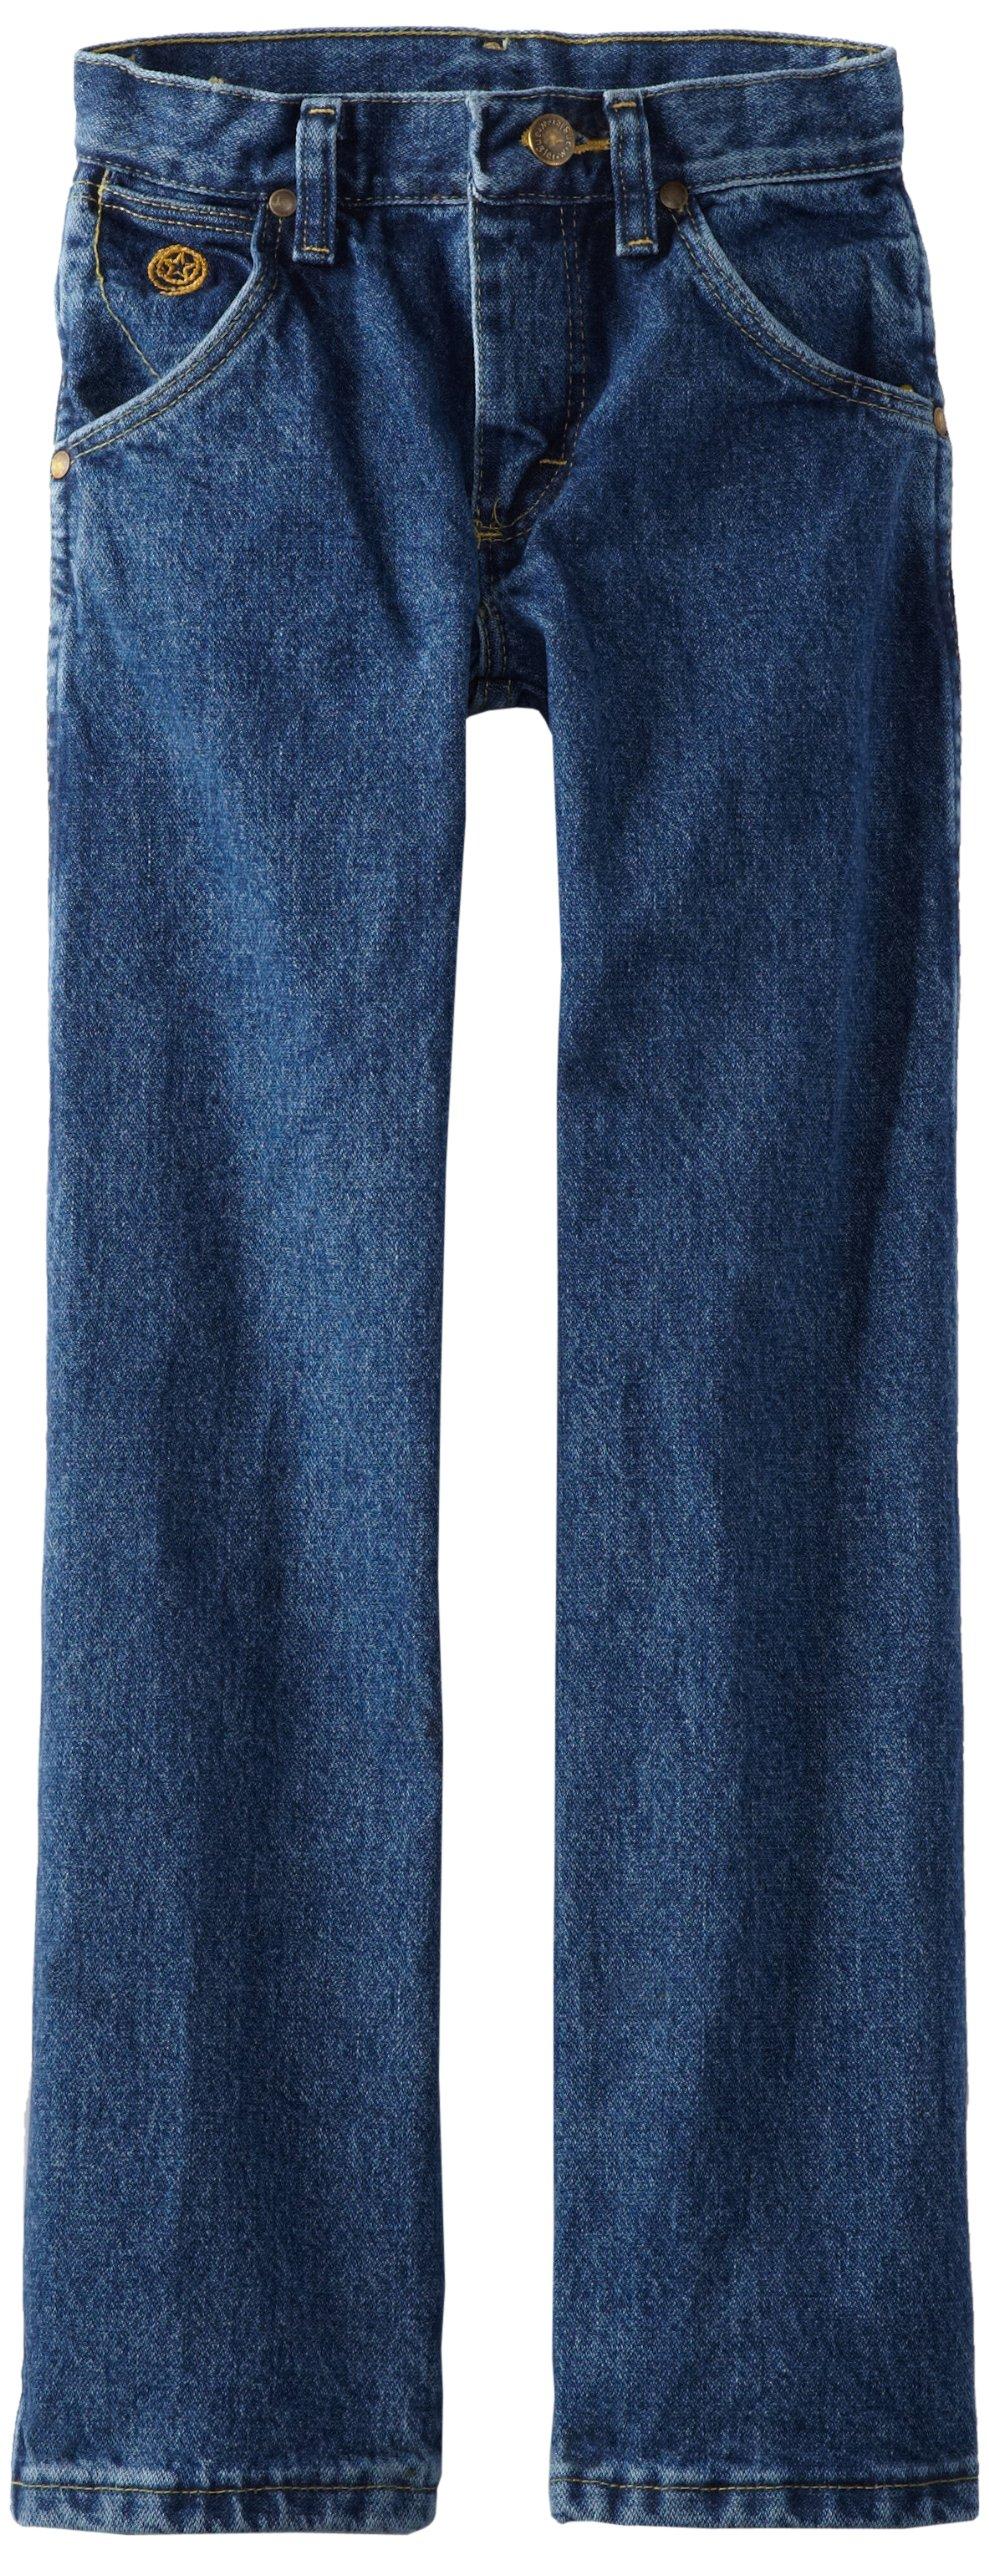 Wrangler Little Boys' Original Cowboy Cut George Strait Jeans, Heavy Denim Stone, 5 Slim